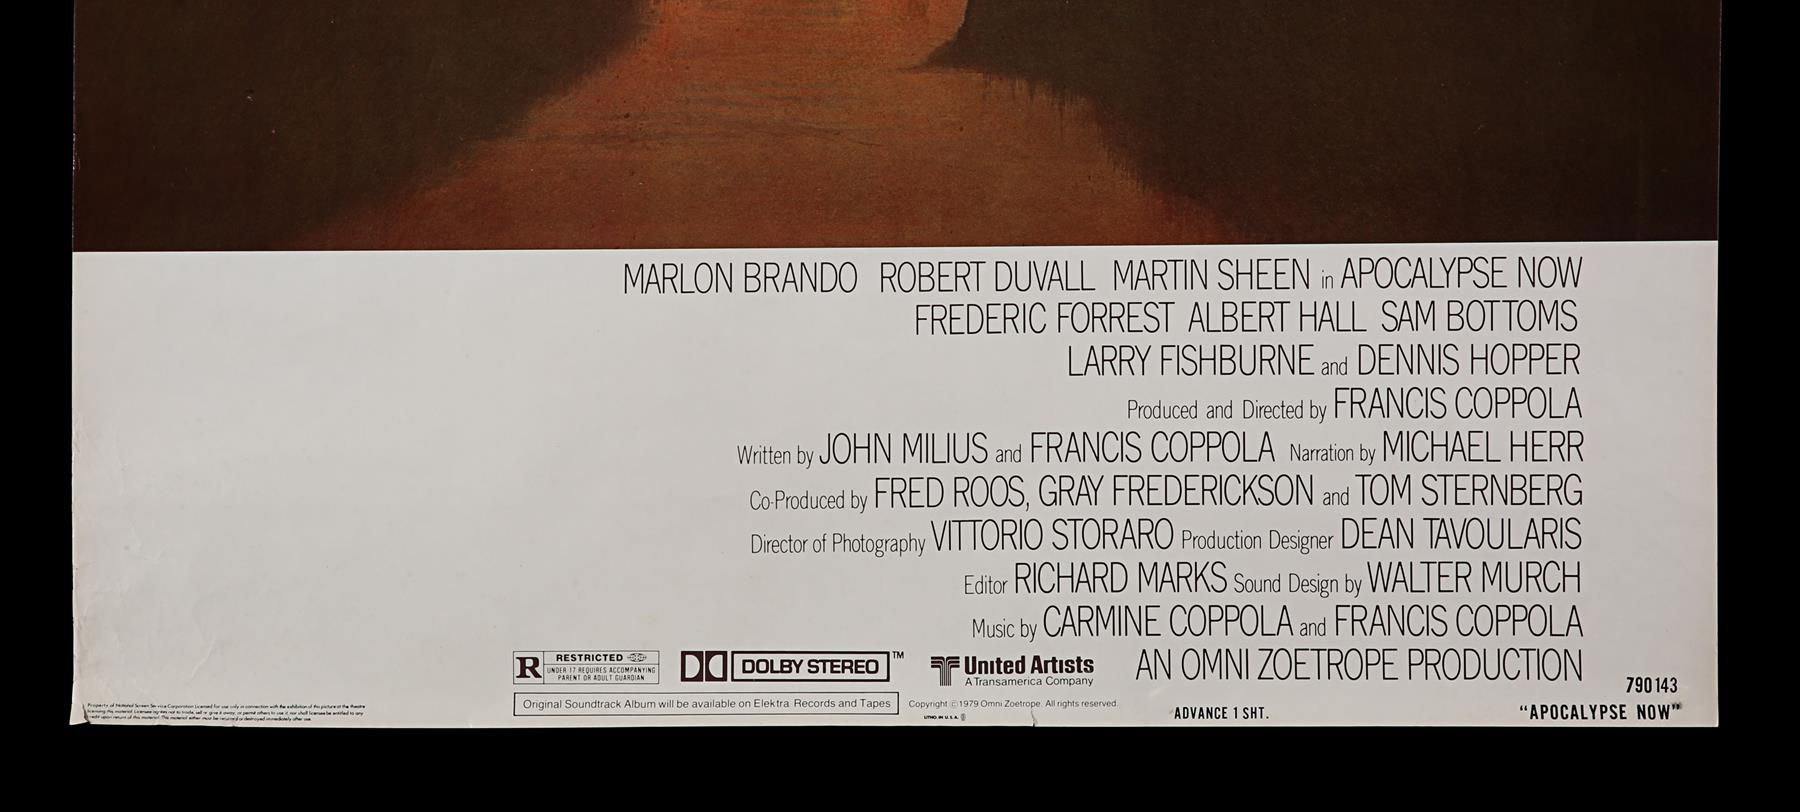 APOCALYPSE NOW (1979) - US One-Sheet, 1979 - Image 2 of 5